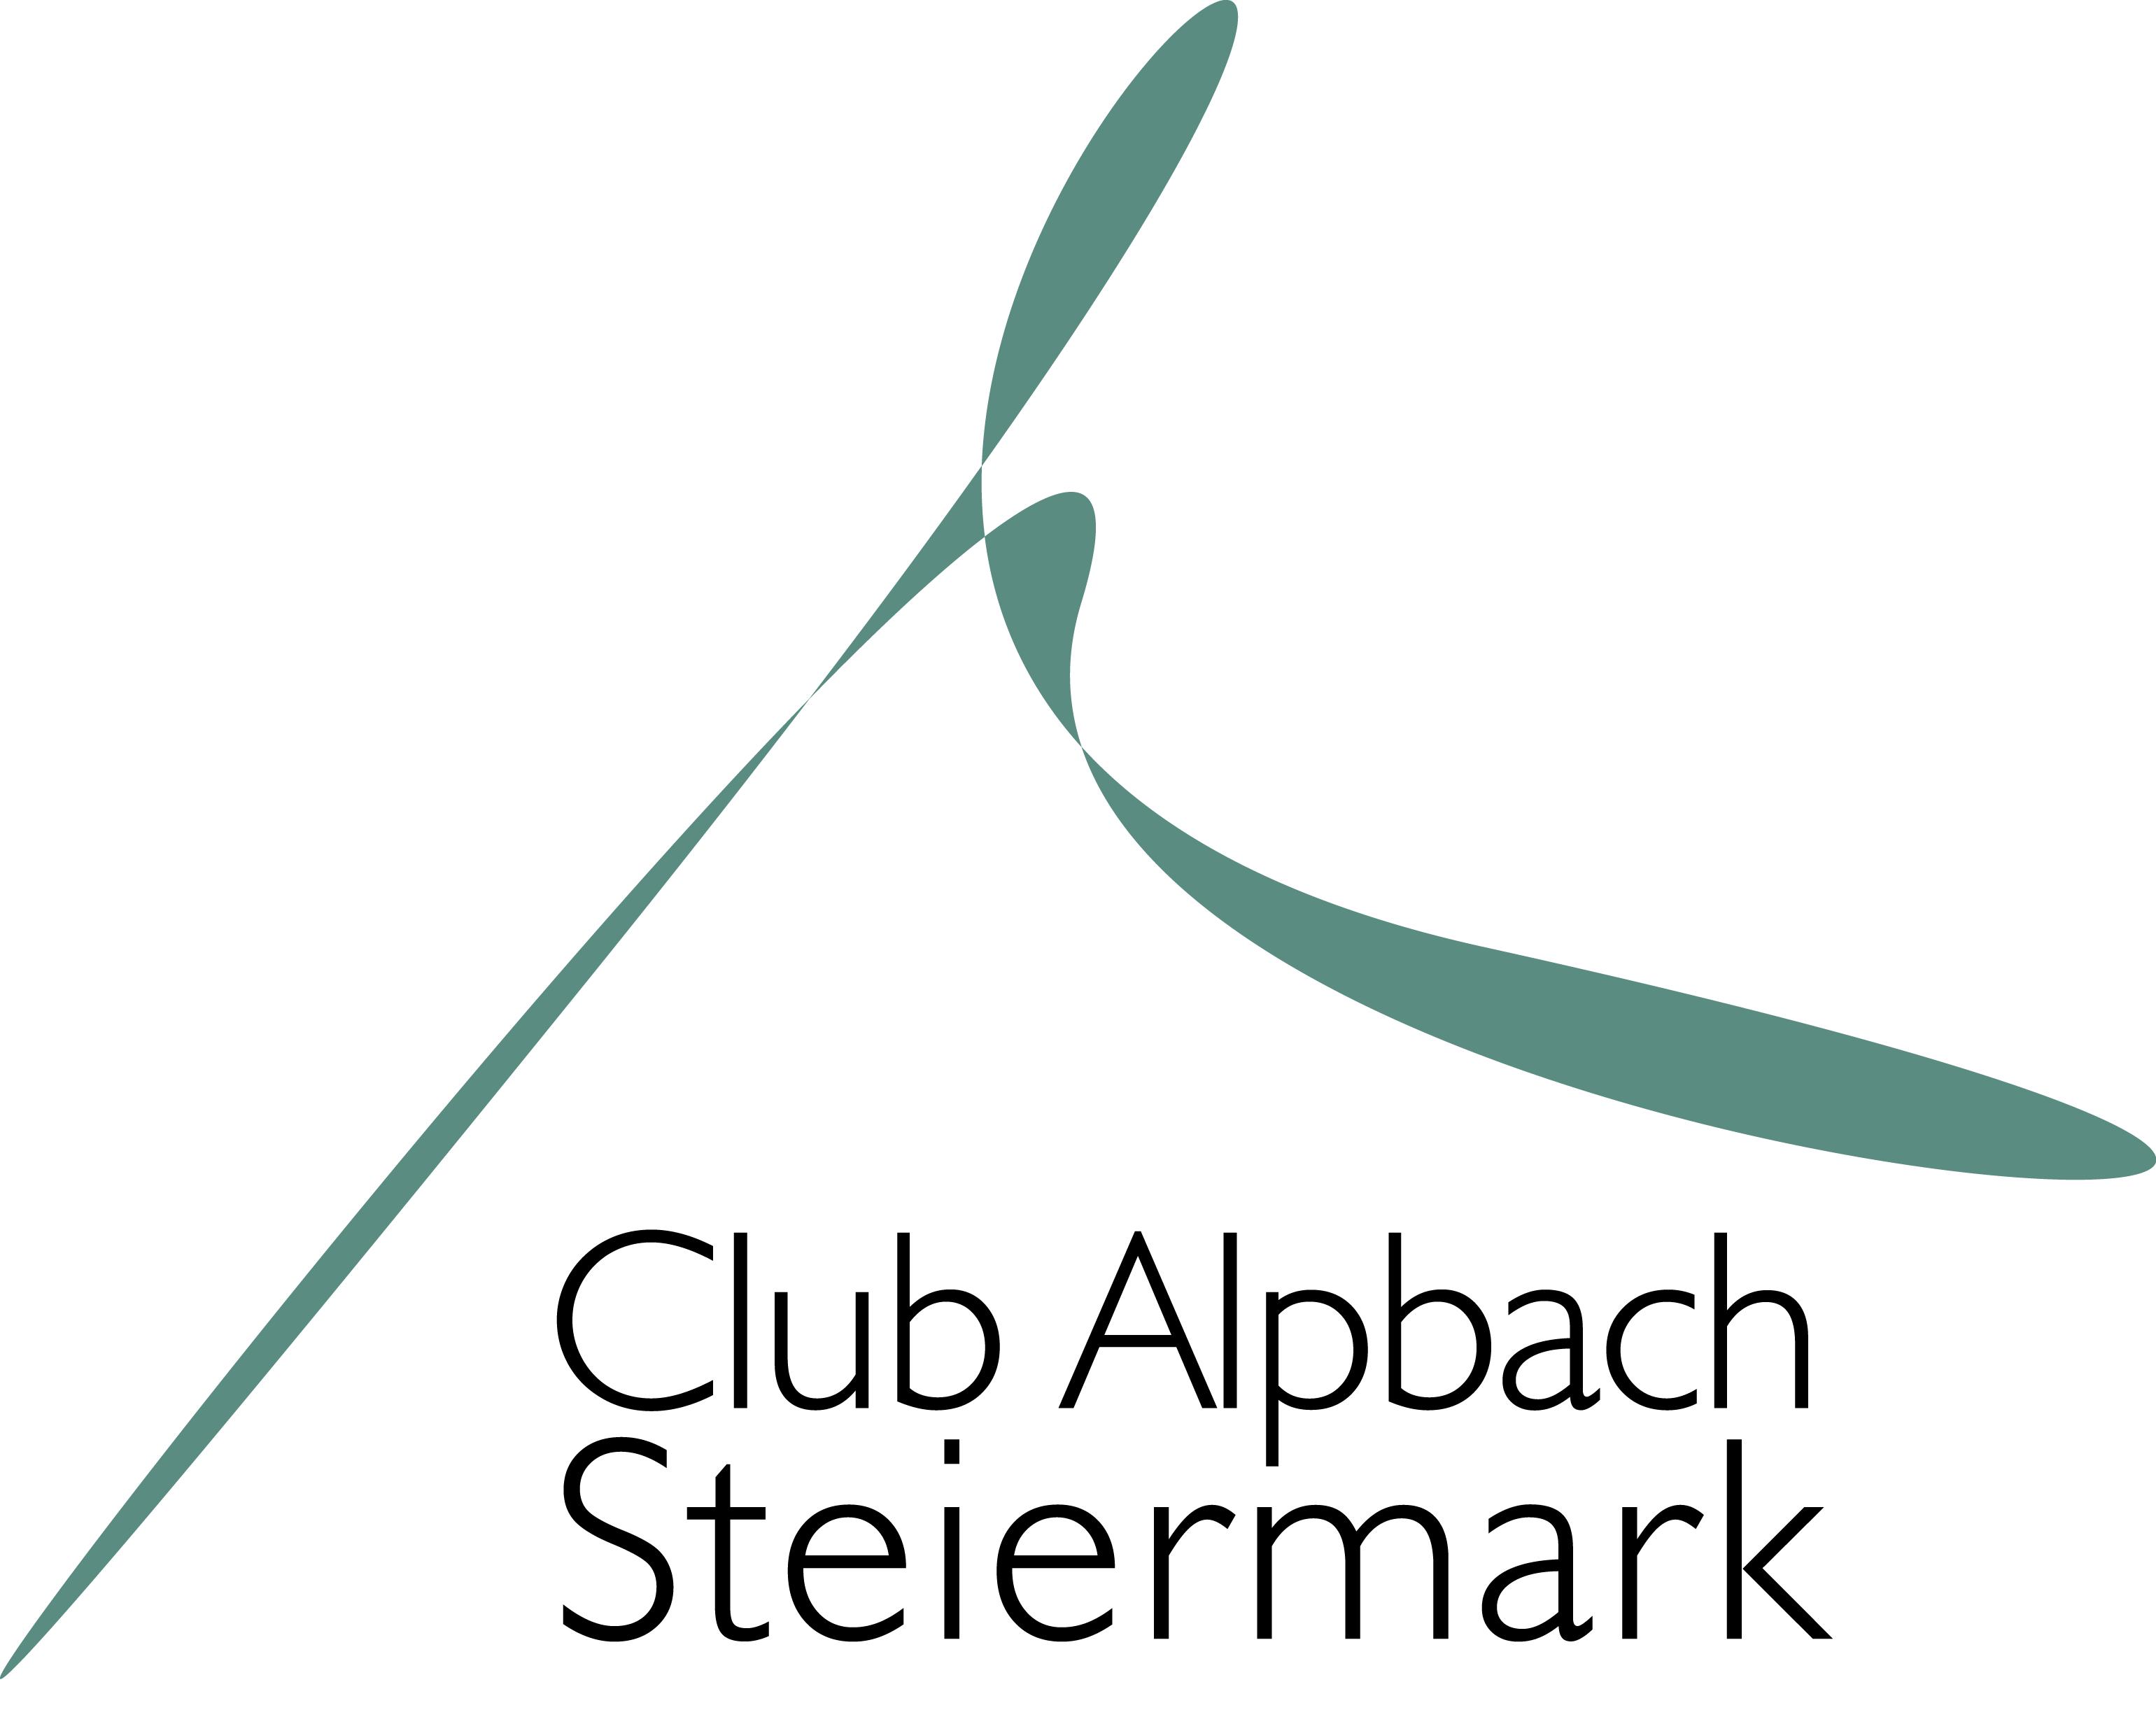 Club Alpbach Steiermark